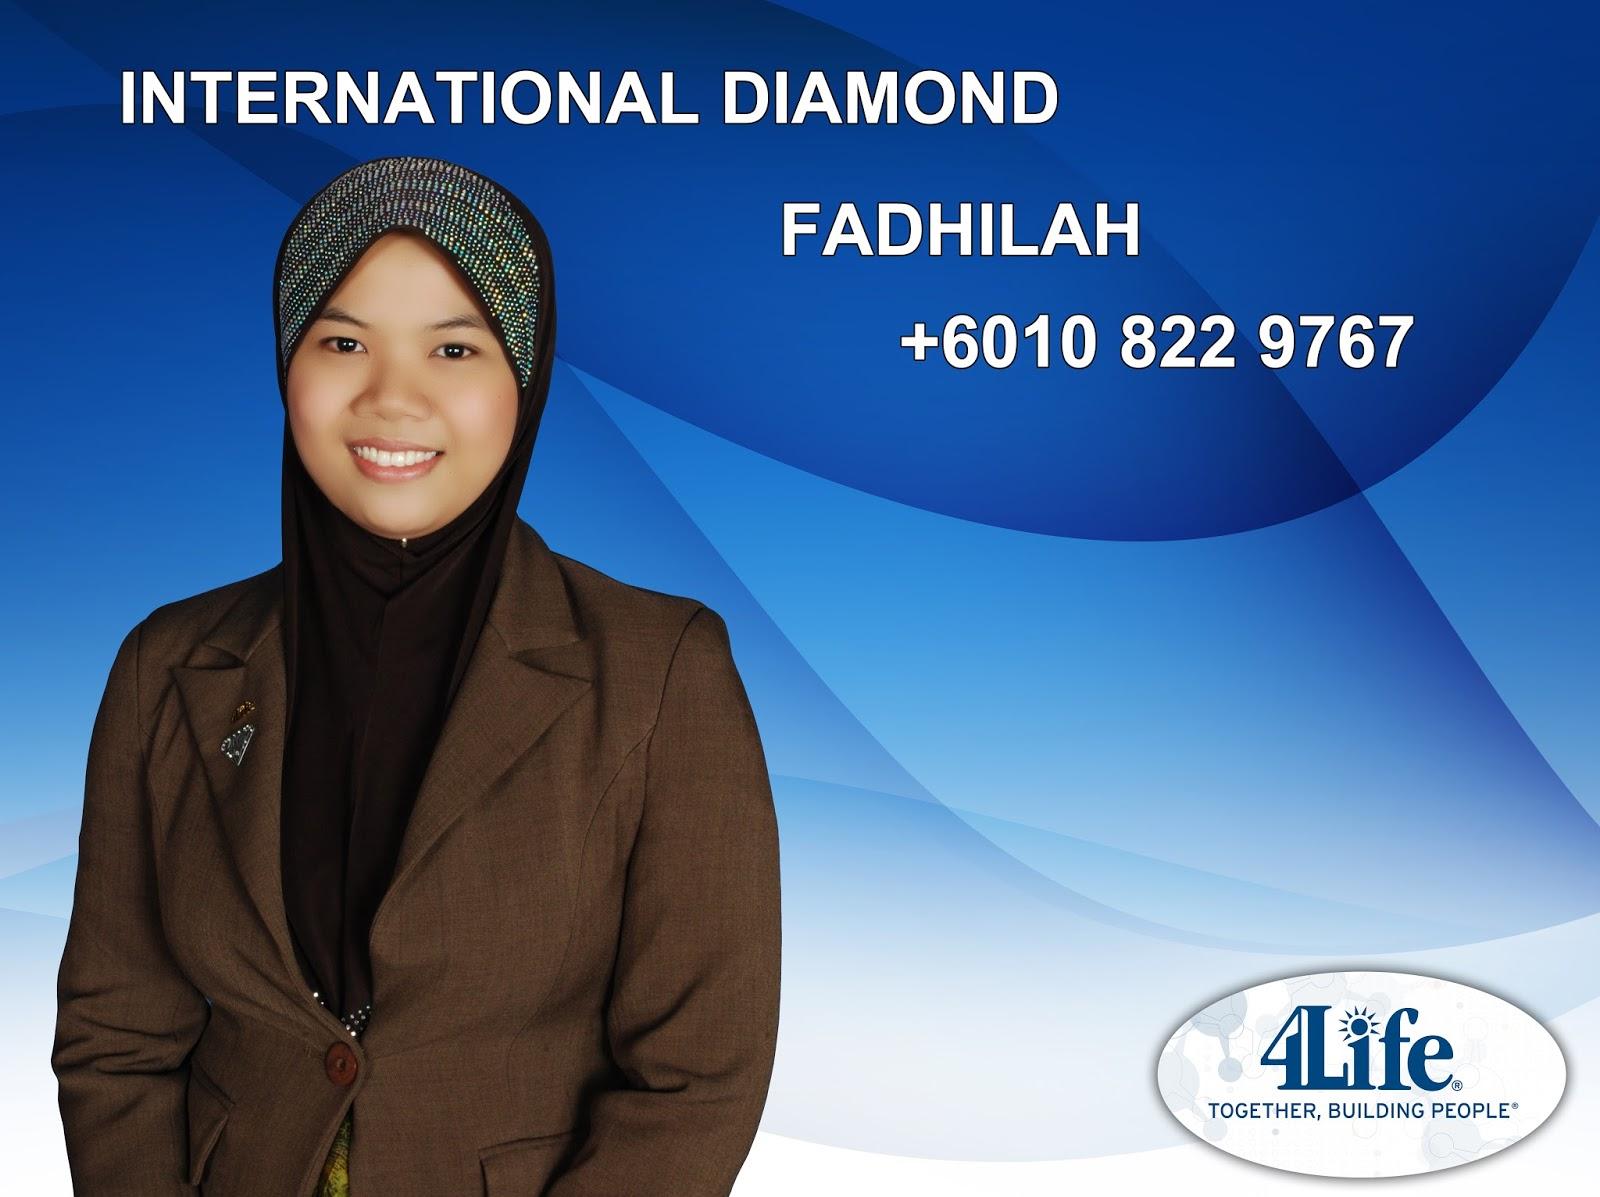 foto Fadhilah - 4Life Group